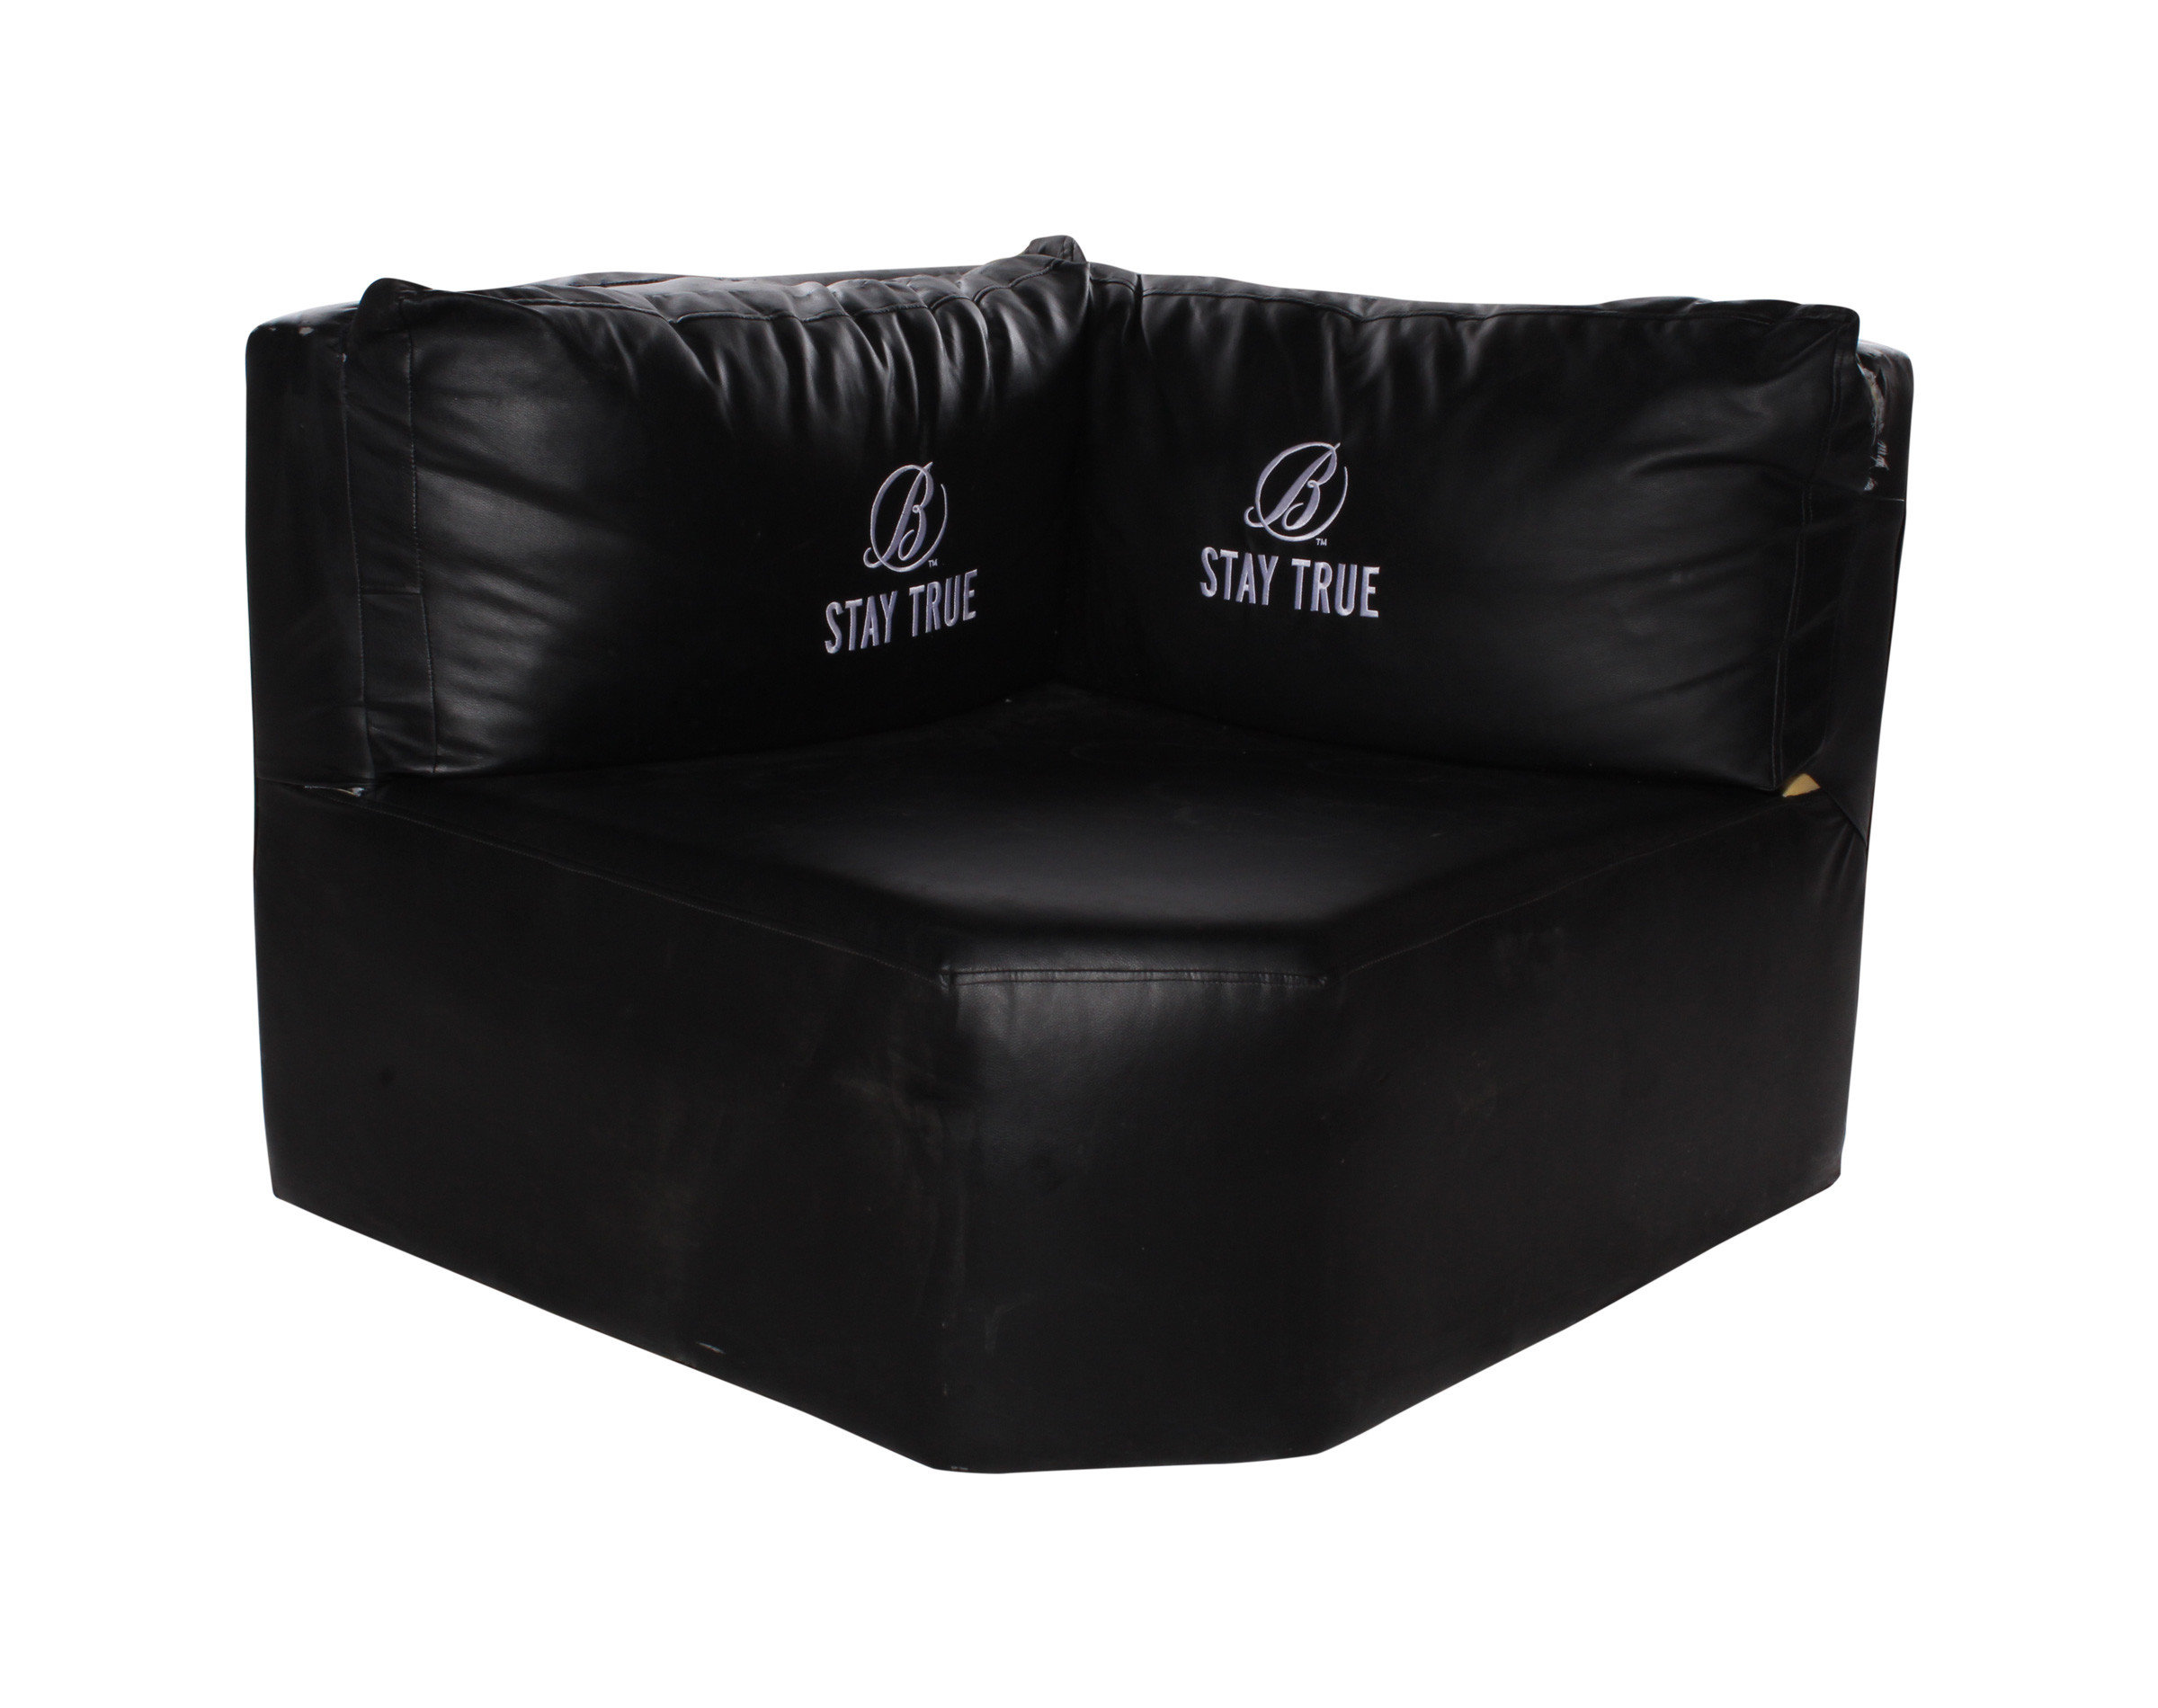 antiguo sofa en cuero para discoteca con logotipo ballantines